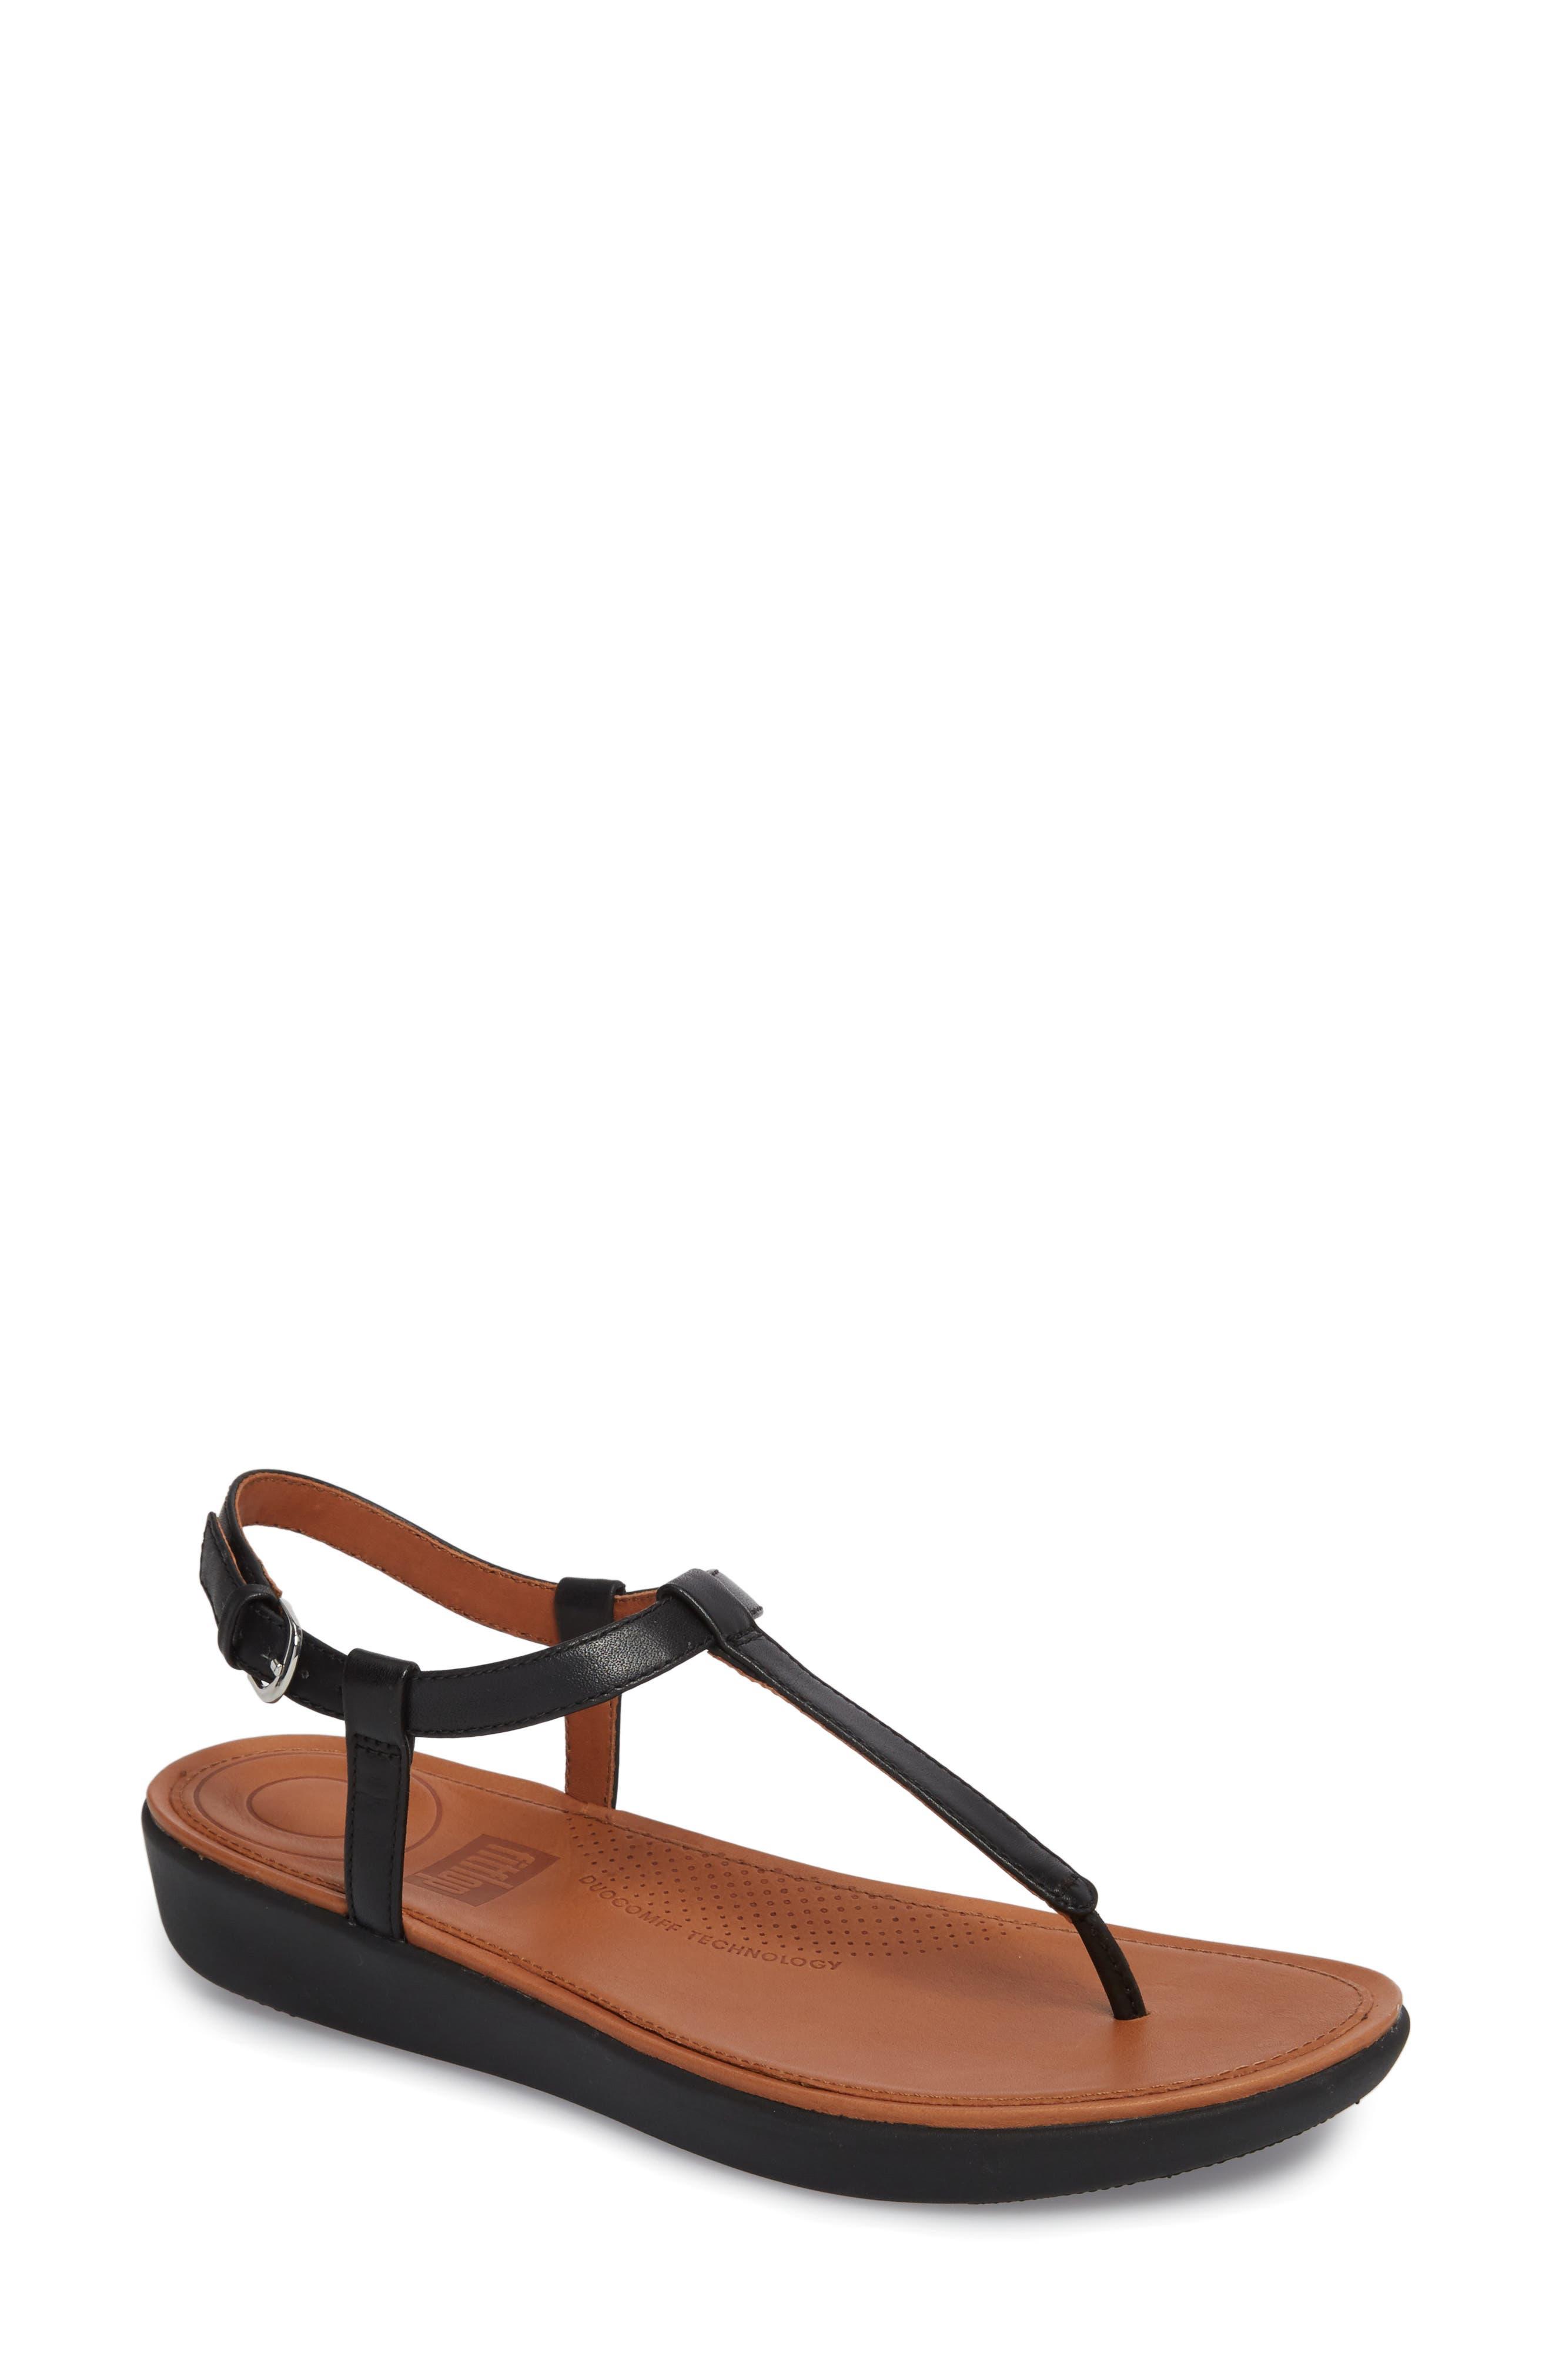 Tia Thong Sandal,                         Main,                         color, Black Leather